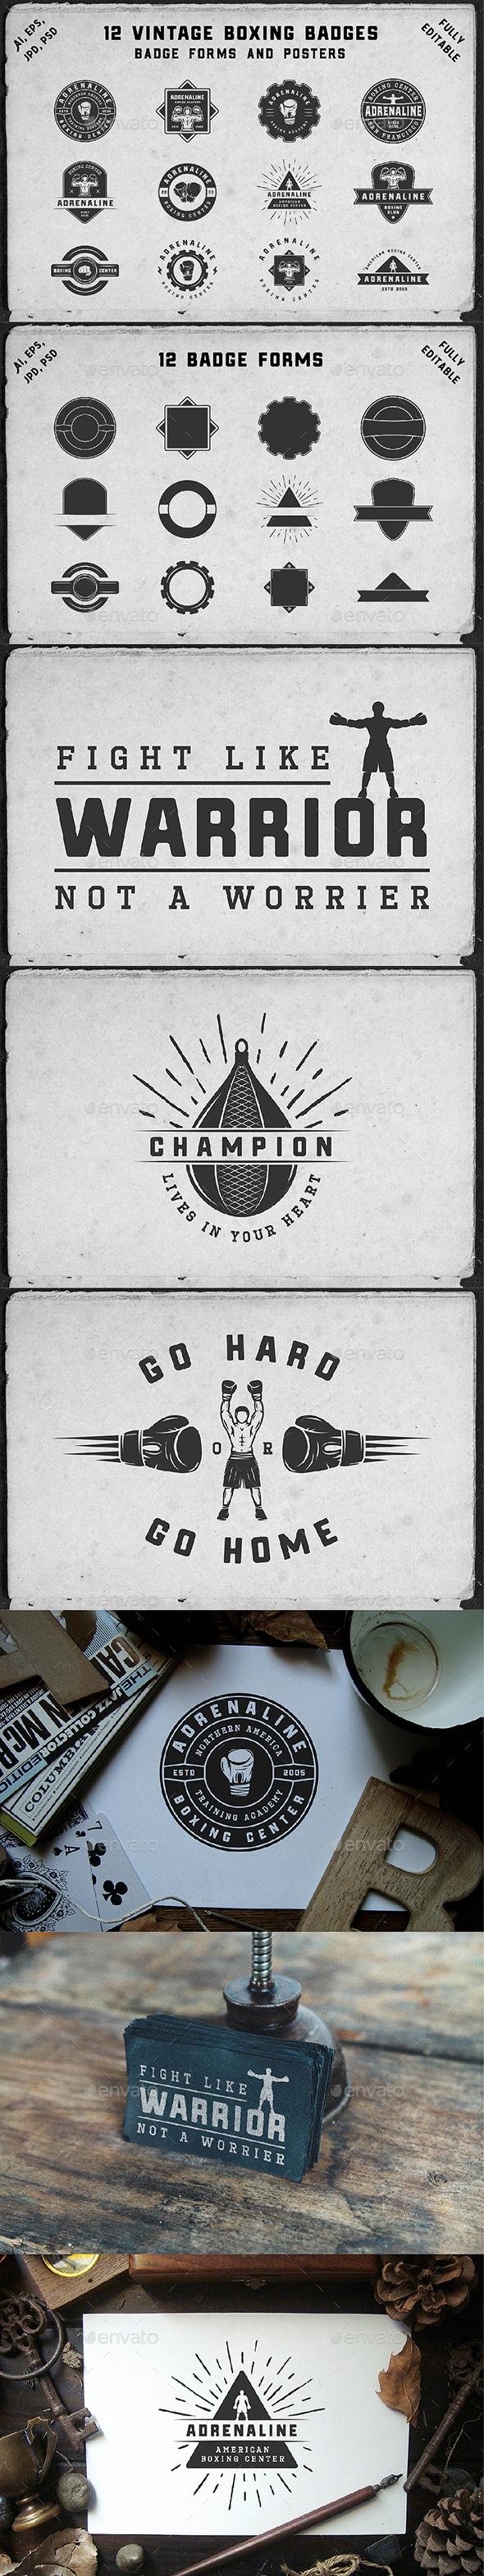 12 Vintage Boxing Badges - Badges & Stickers Web Elements